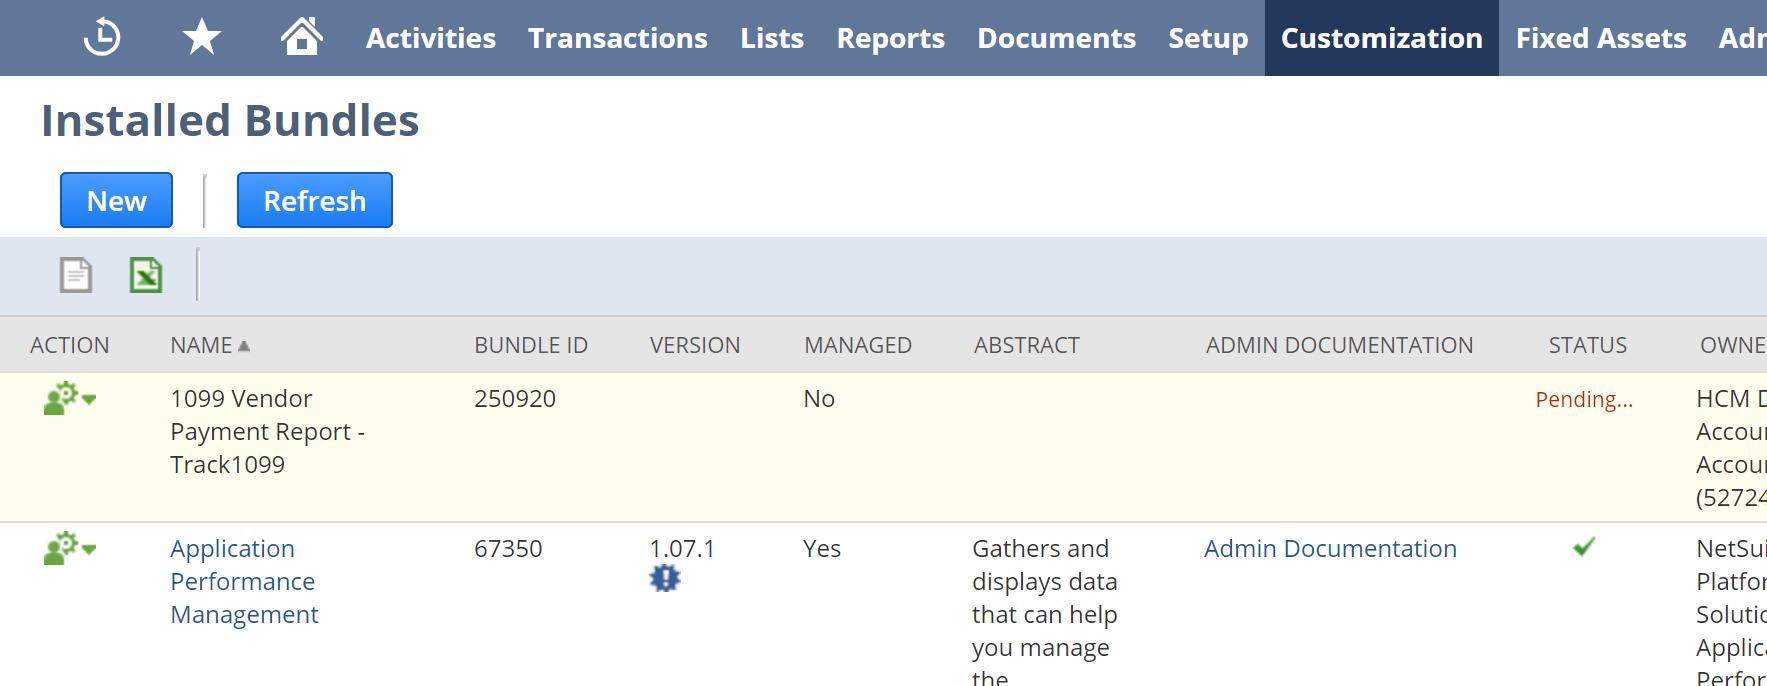 NetSuite Bundle - Track1099